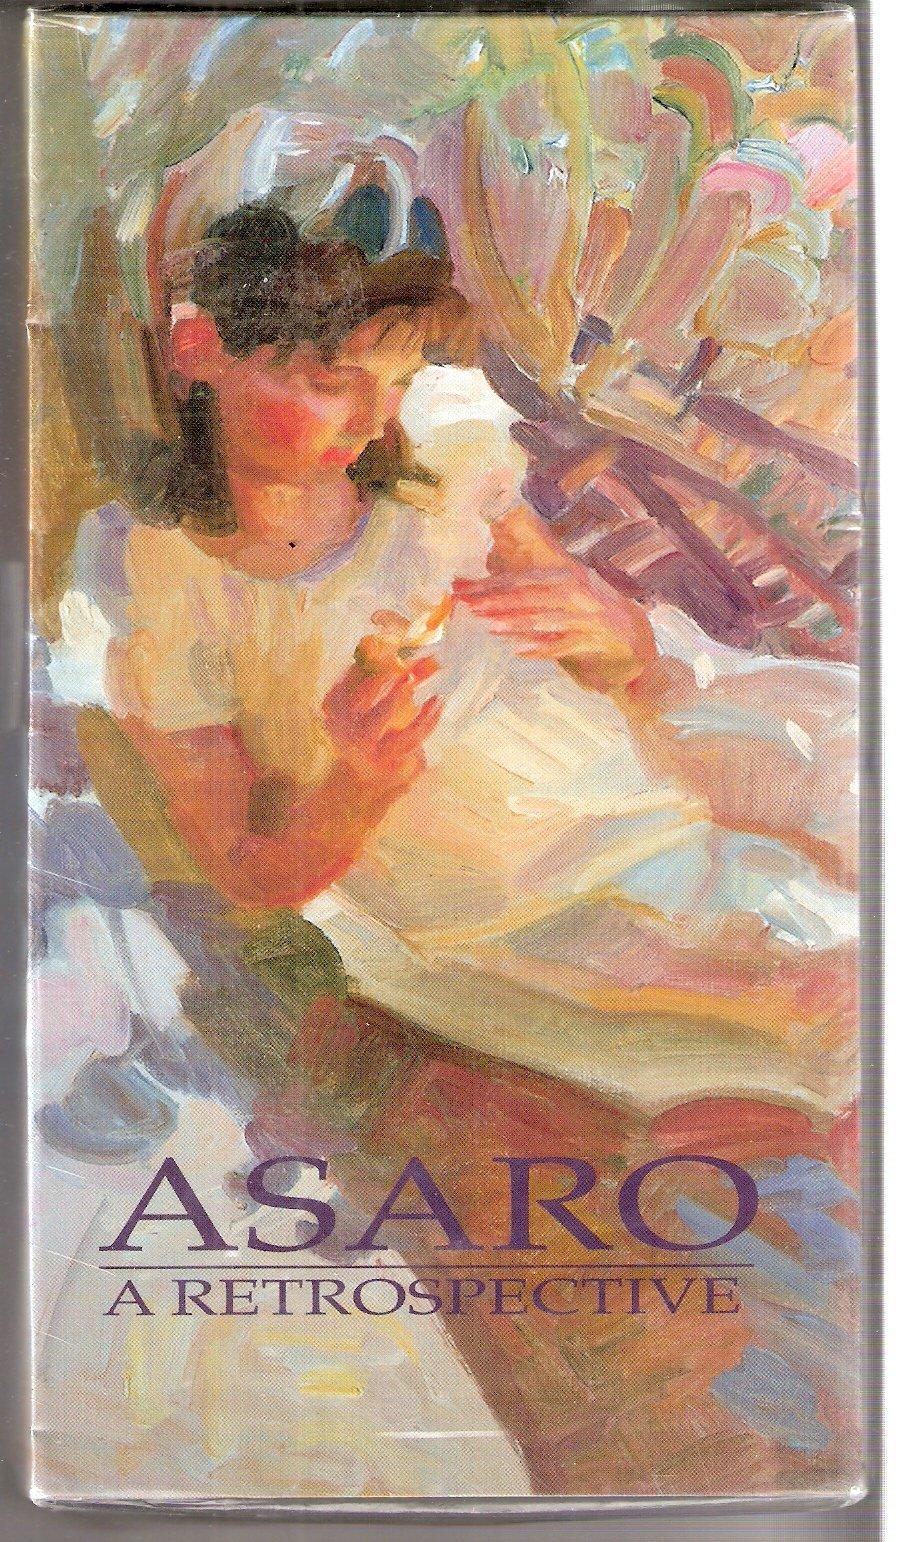 Asaro: A Restrospective [VHS] by